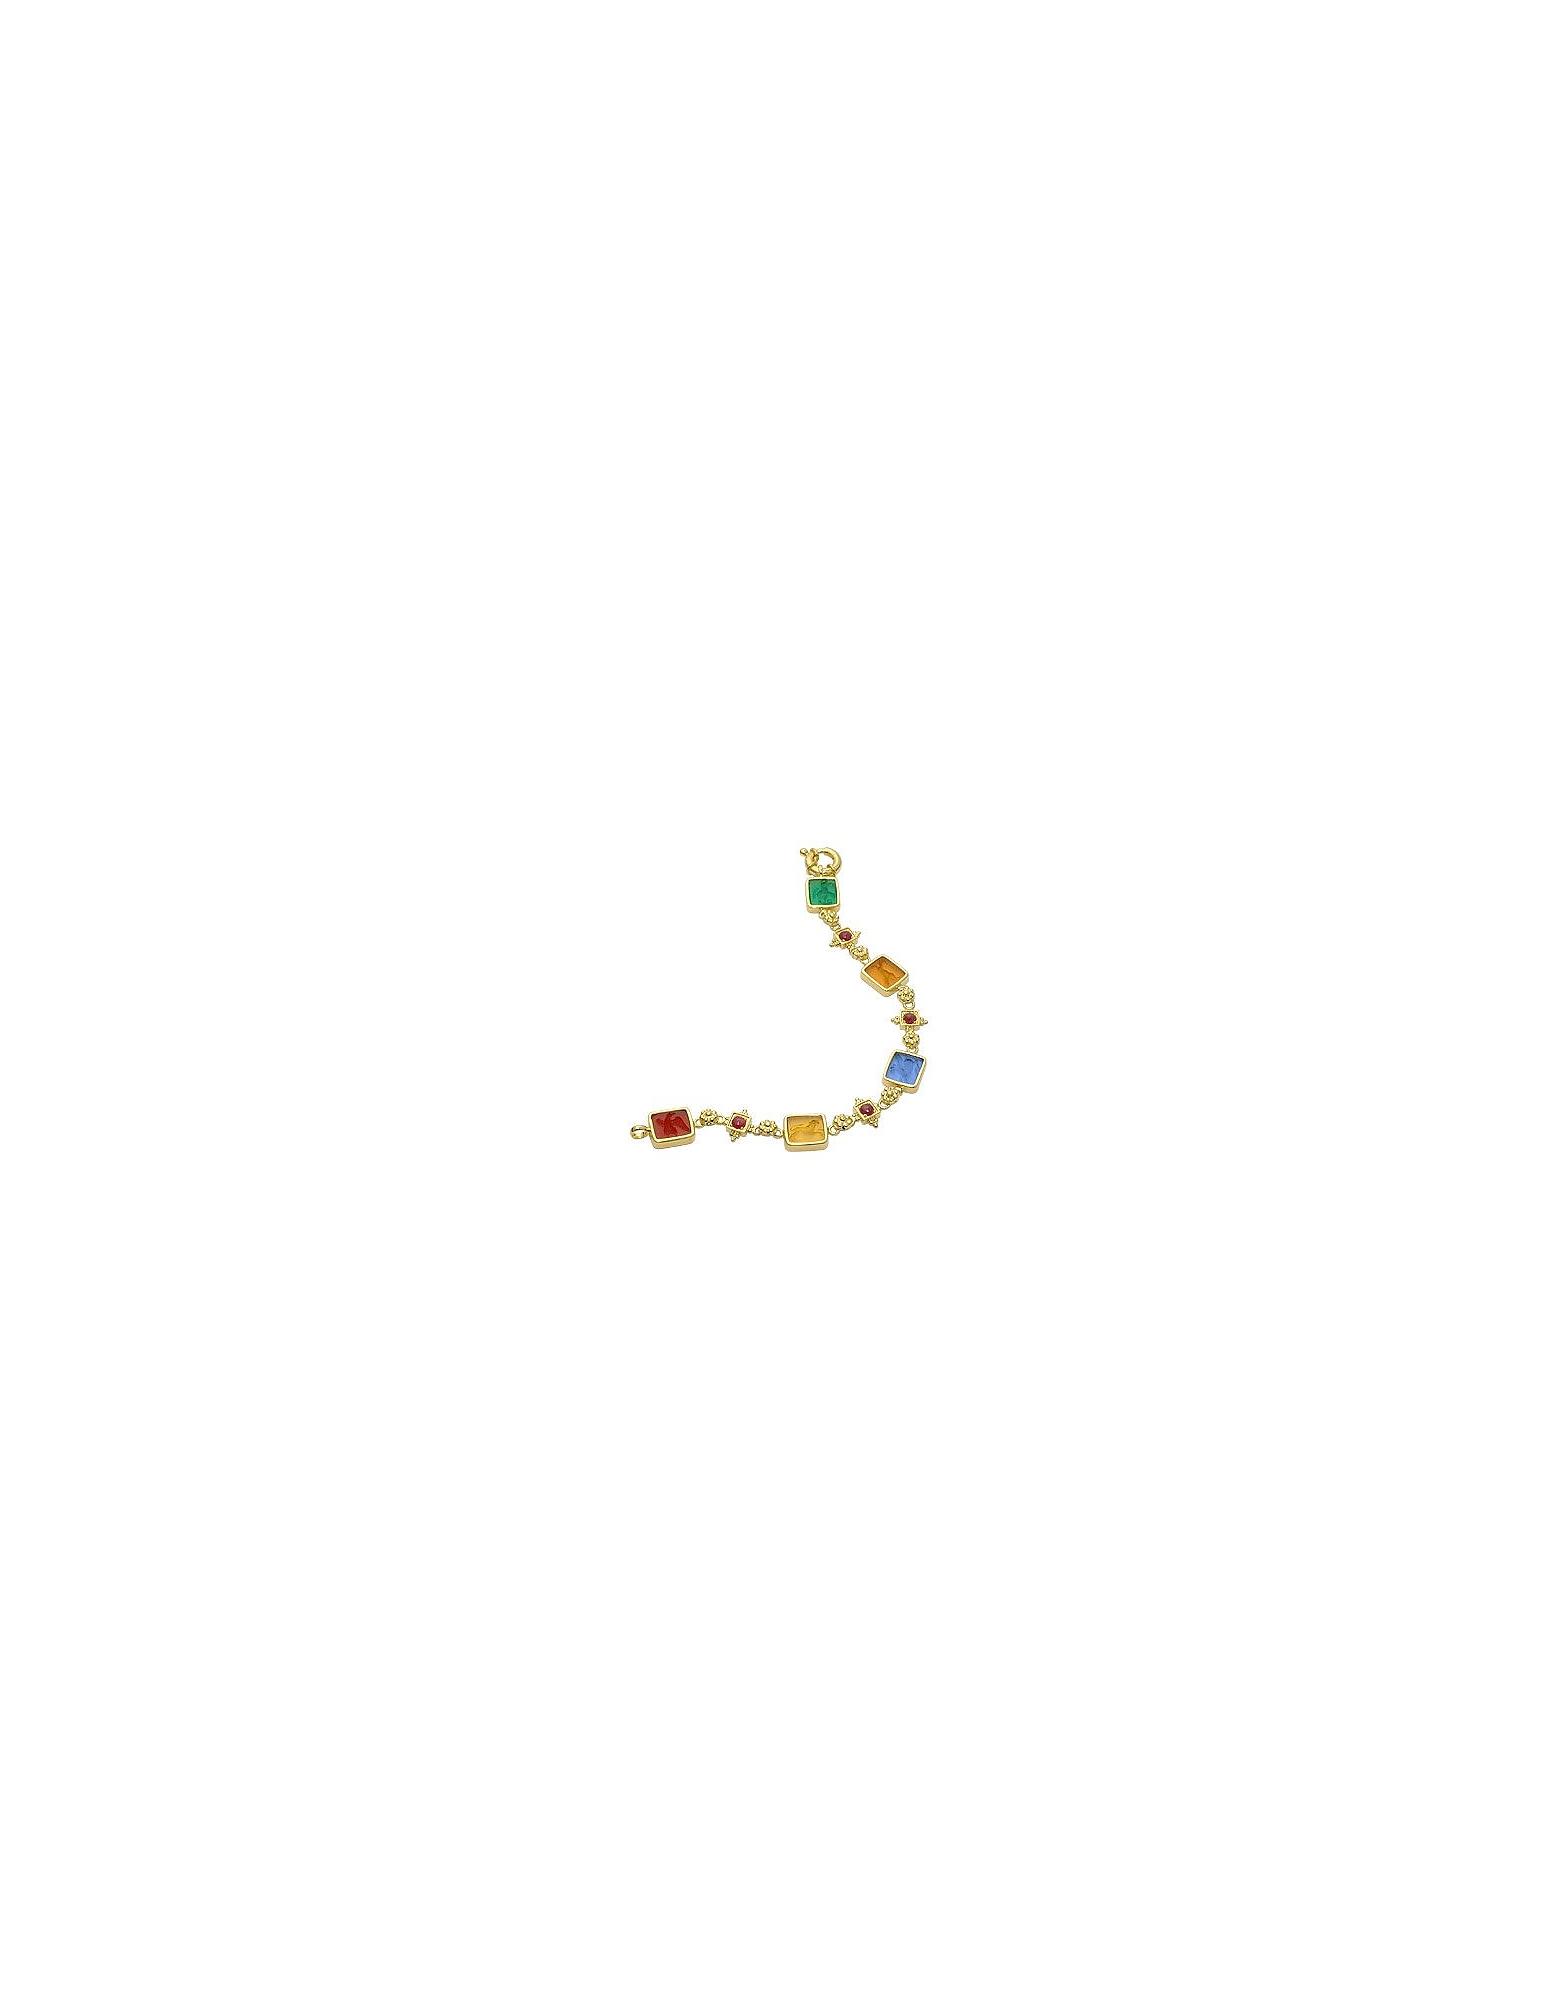 Tagliamonte Designer Bracelets, Classics Collection - 18K Gold and Ruby Link Bracelet